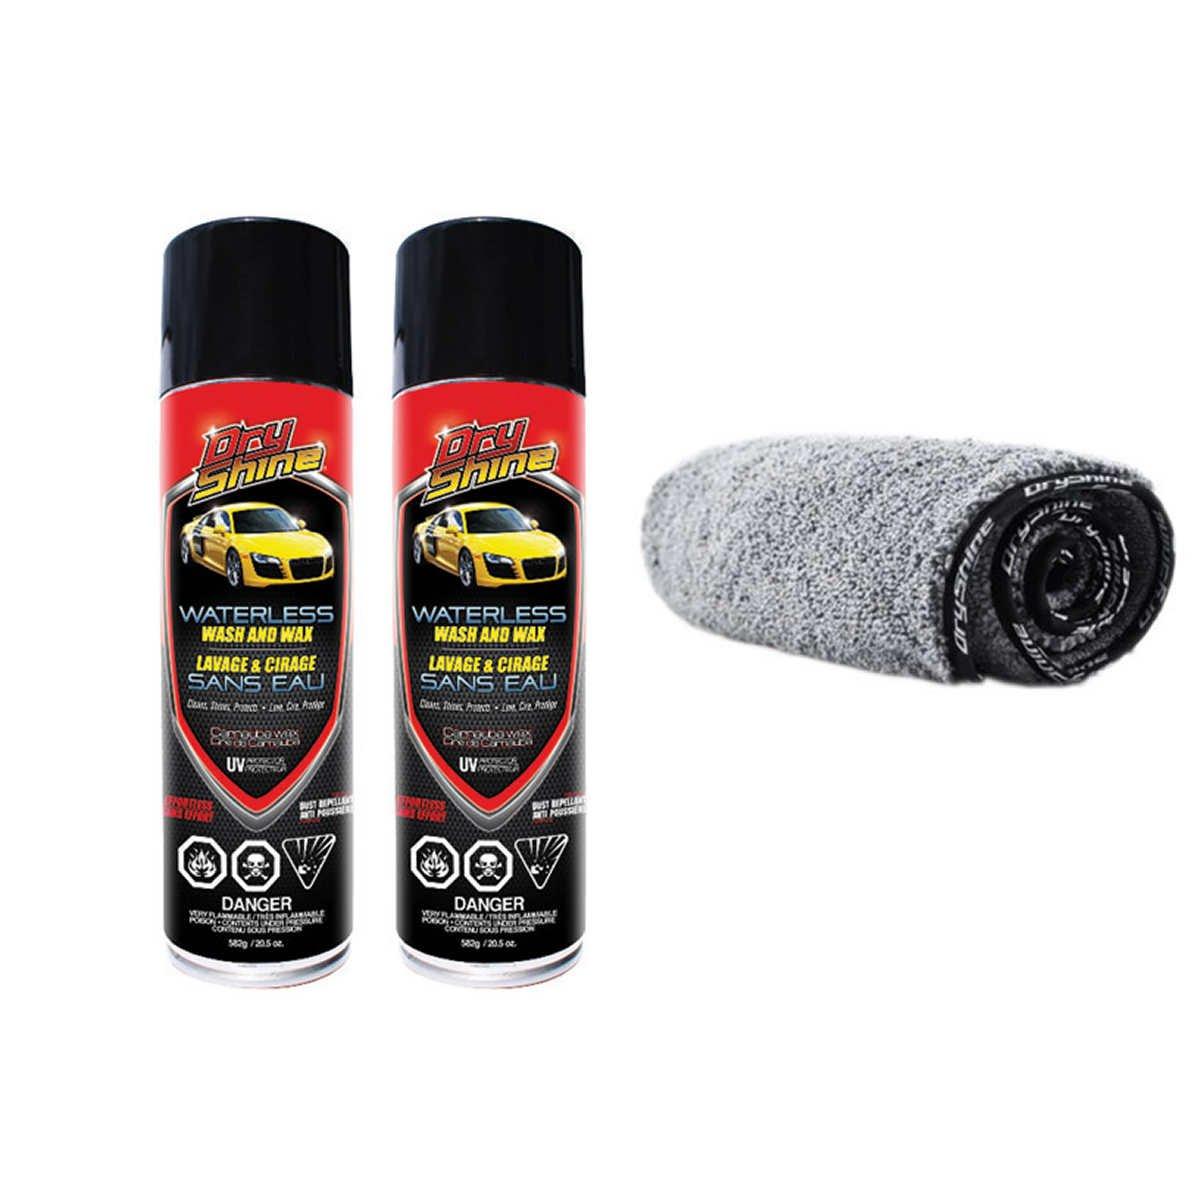 Dry Shine Waterless Car Wash and Wax, 2-pack + 2-in-1 Microfiber Towel Kit